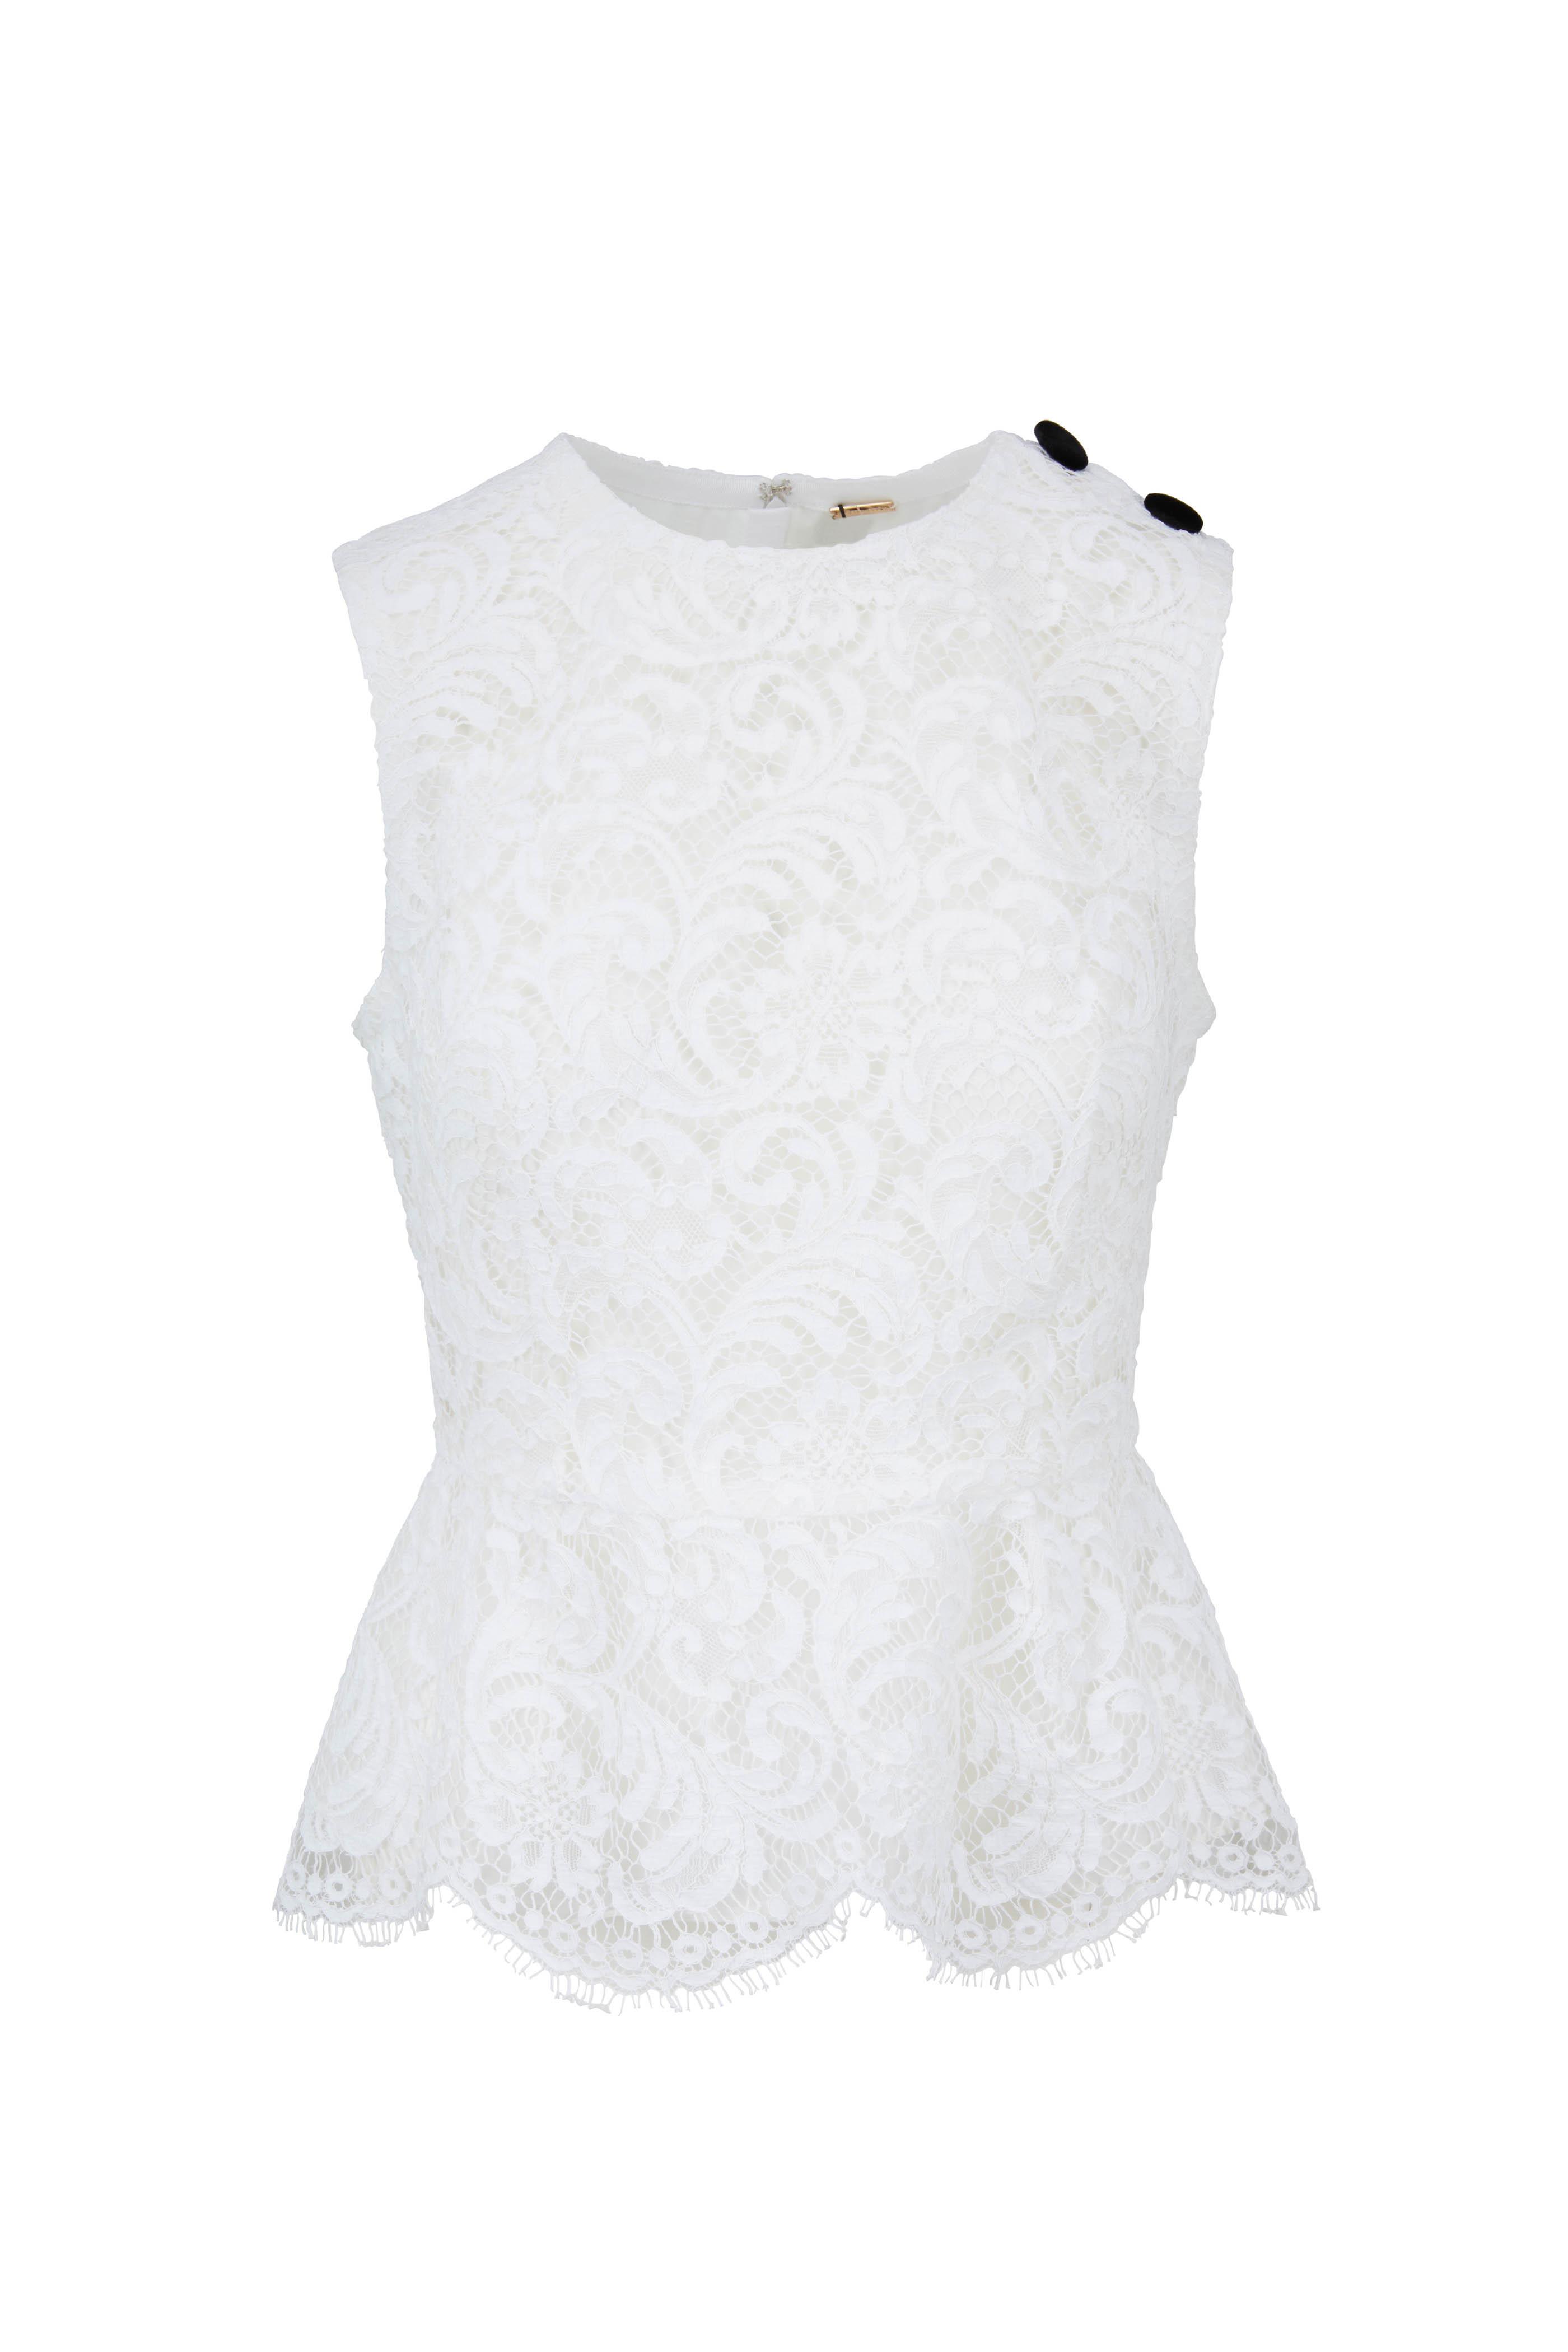 8f113e5eeb0708 Adam Lippes - White Lace Sleeveless Peplum Top